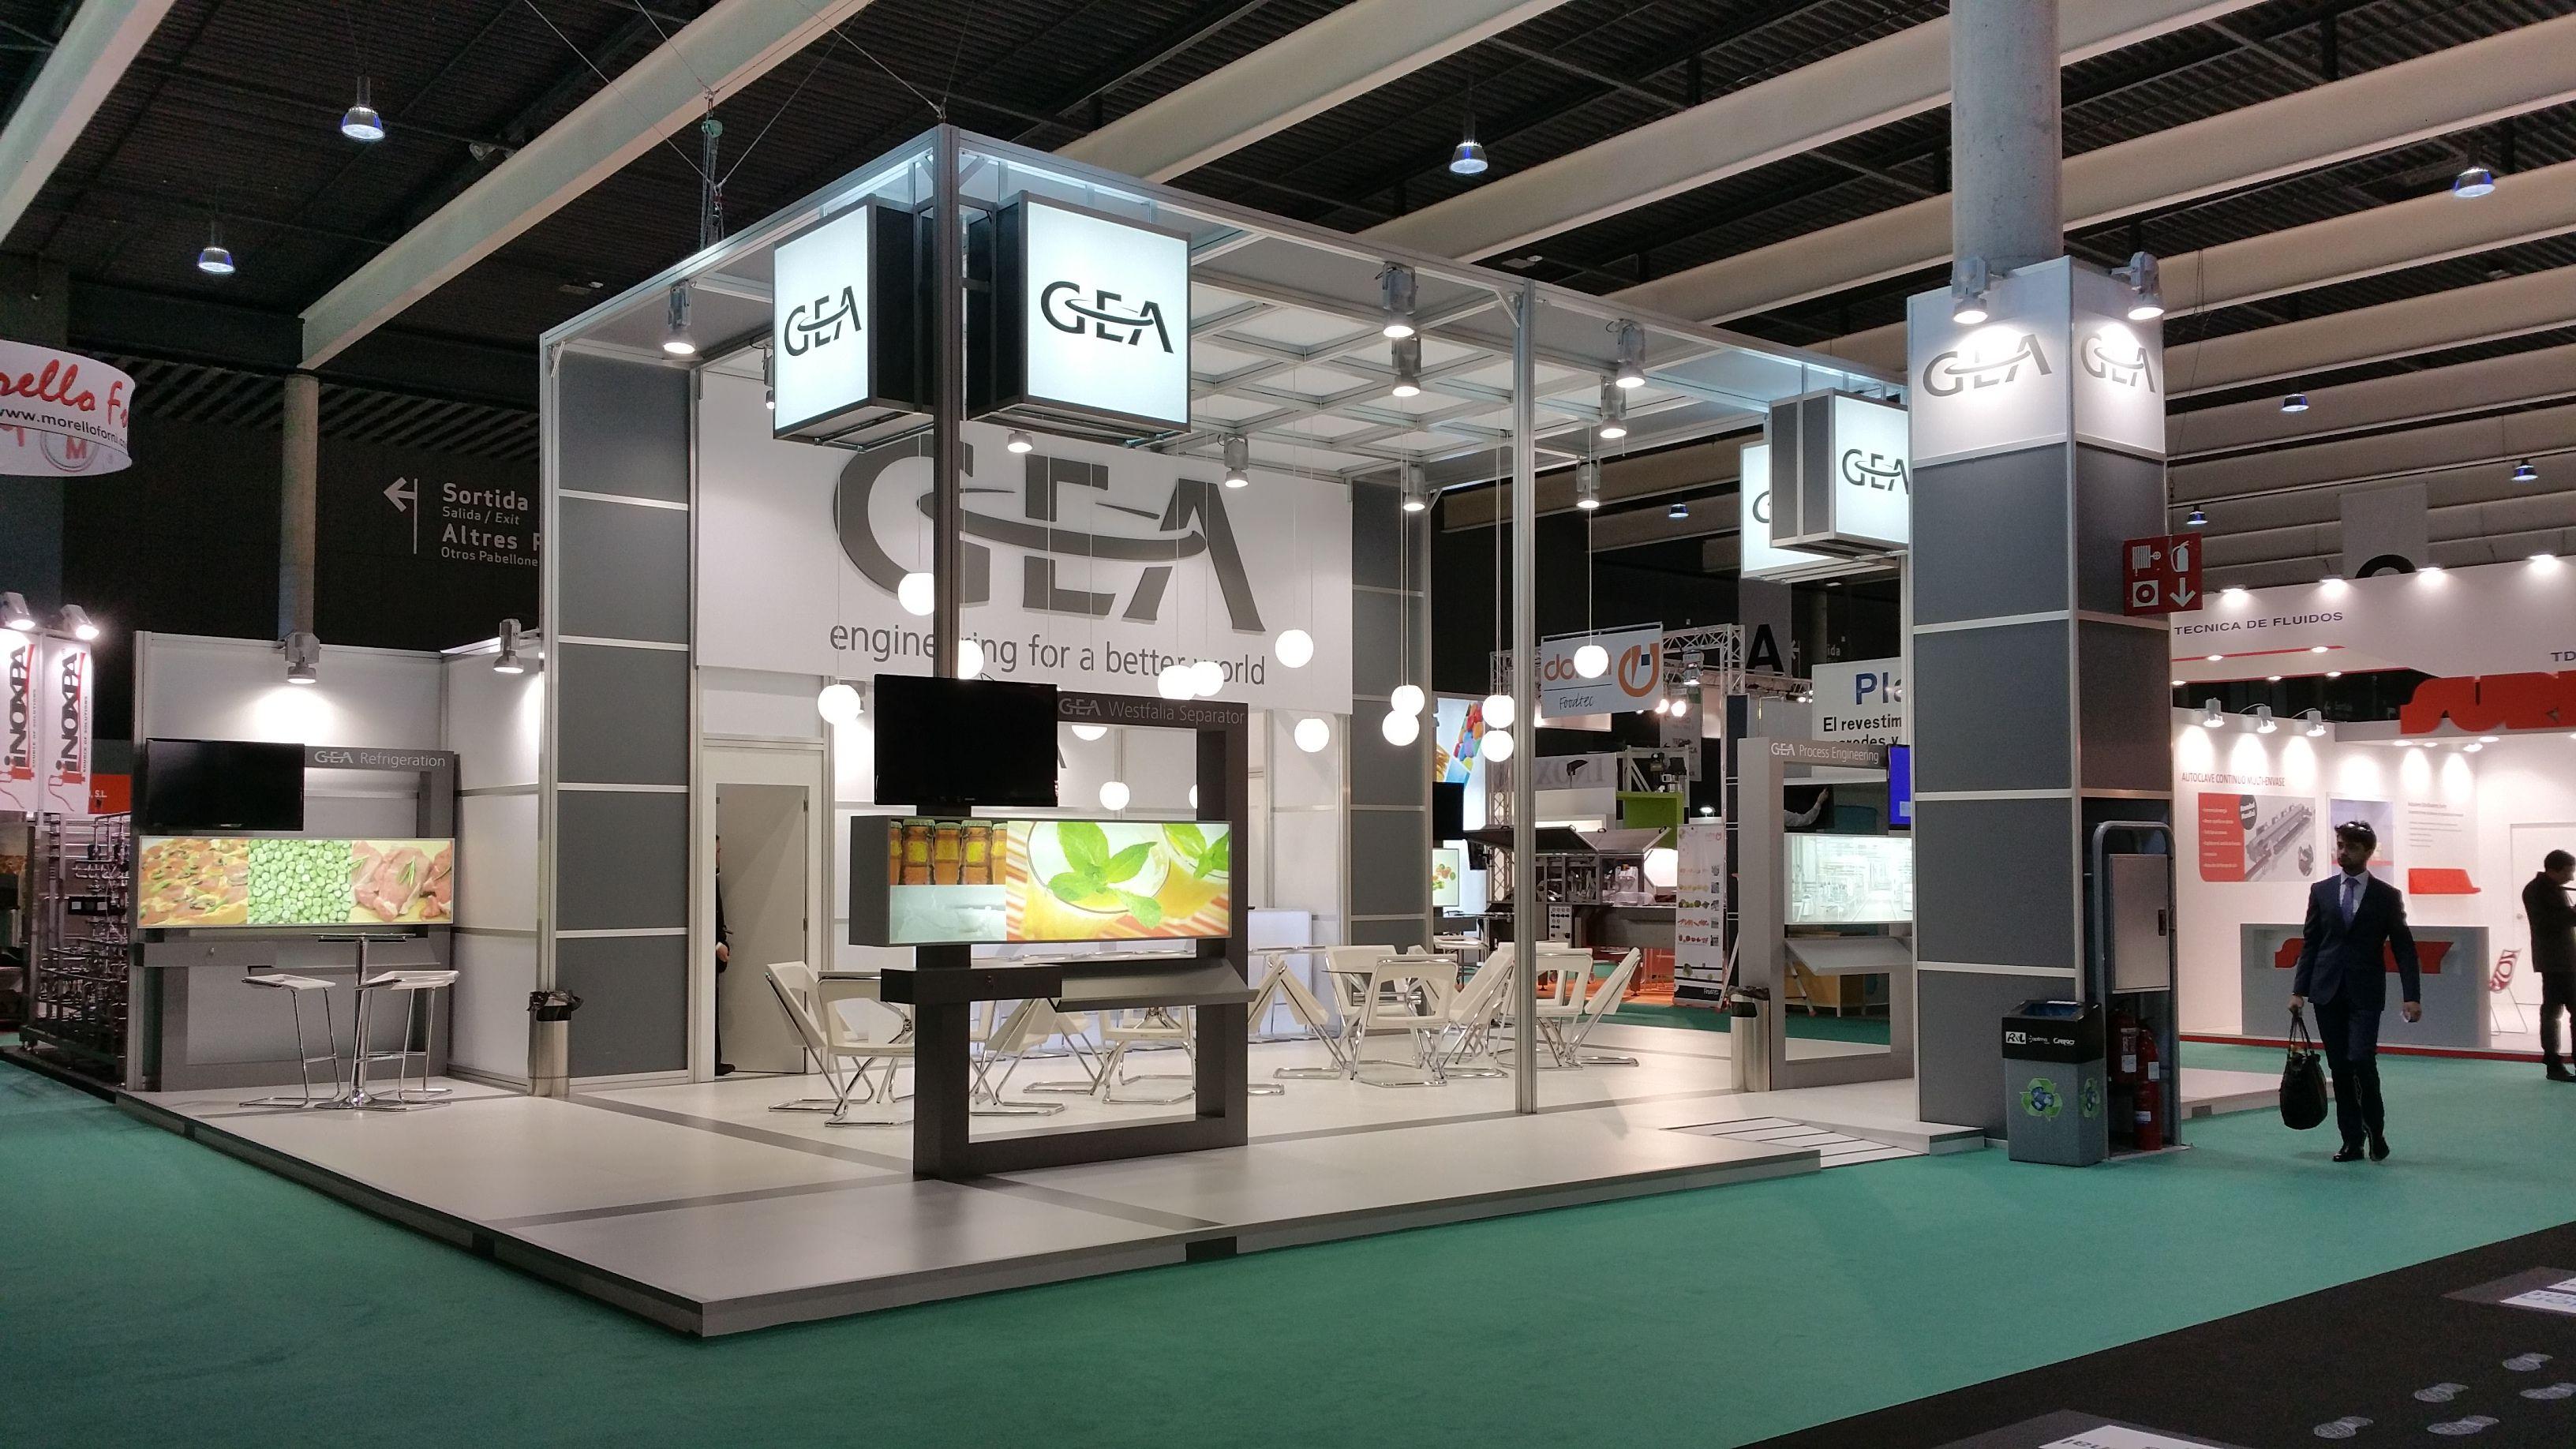 Expo Stands 2015 : Juan fuentes stand para gea bta barcelona spain